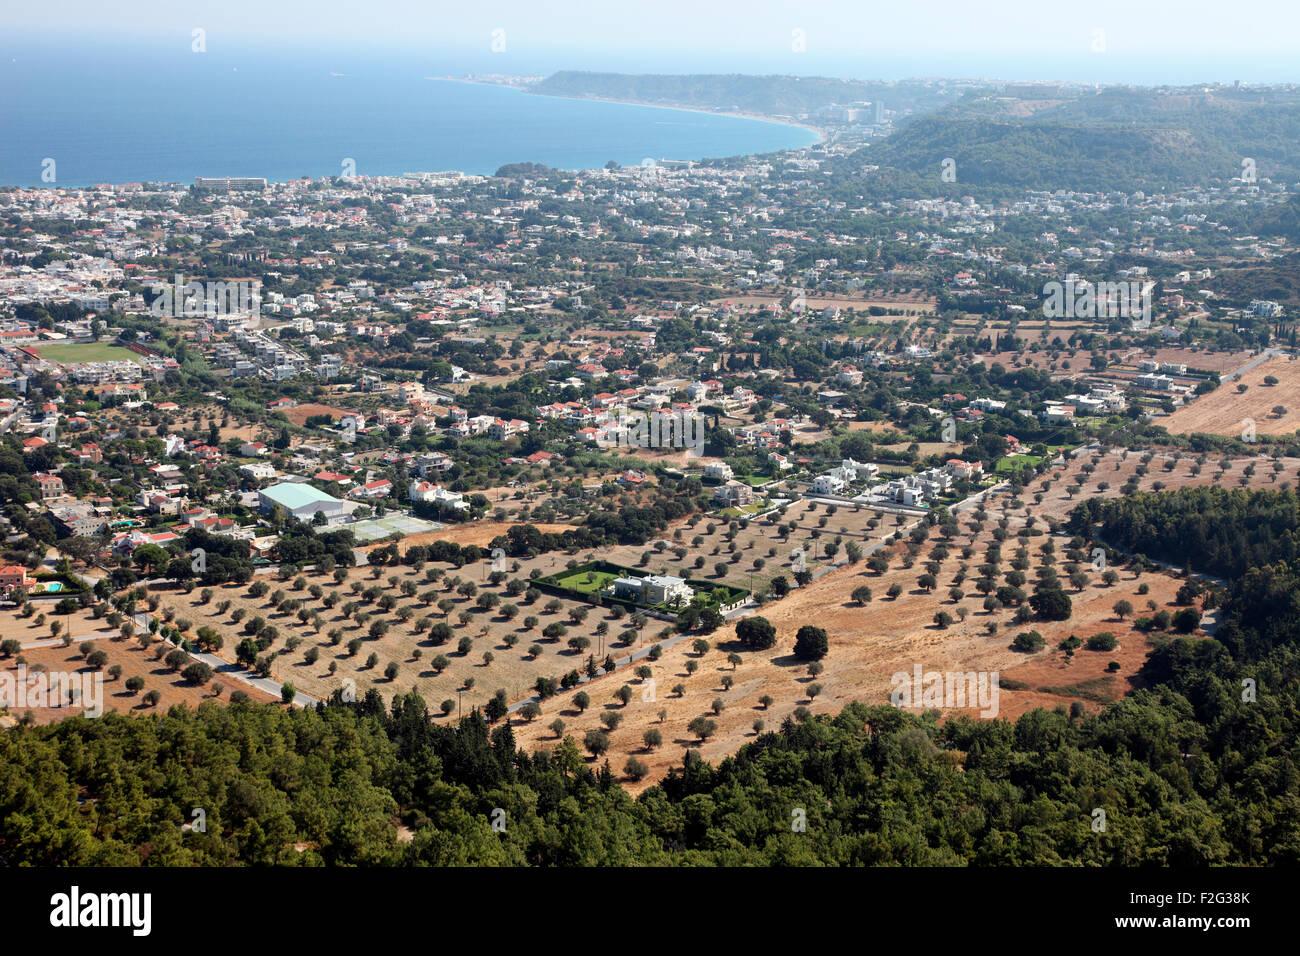 Ialyssos Plain seen from Mount Filerimos, Rhodes - Stock Image